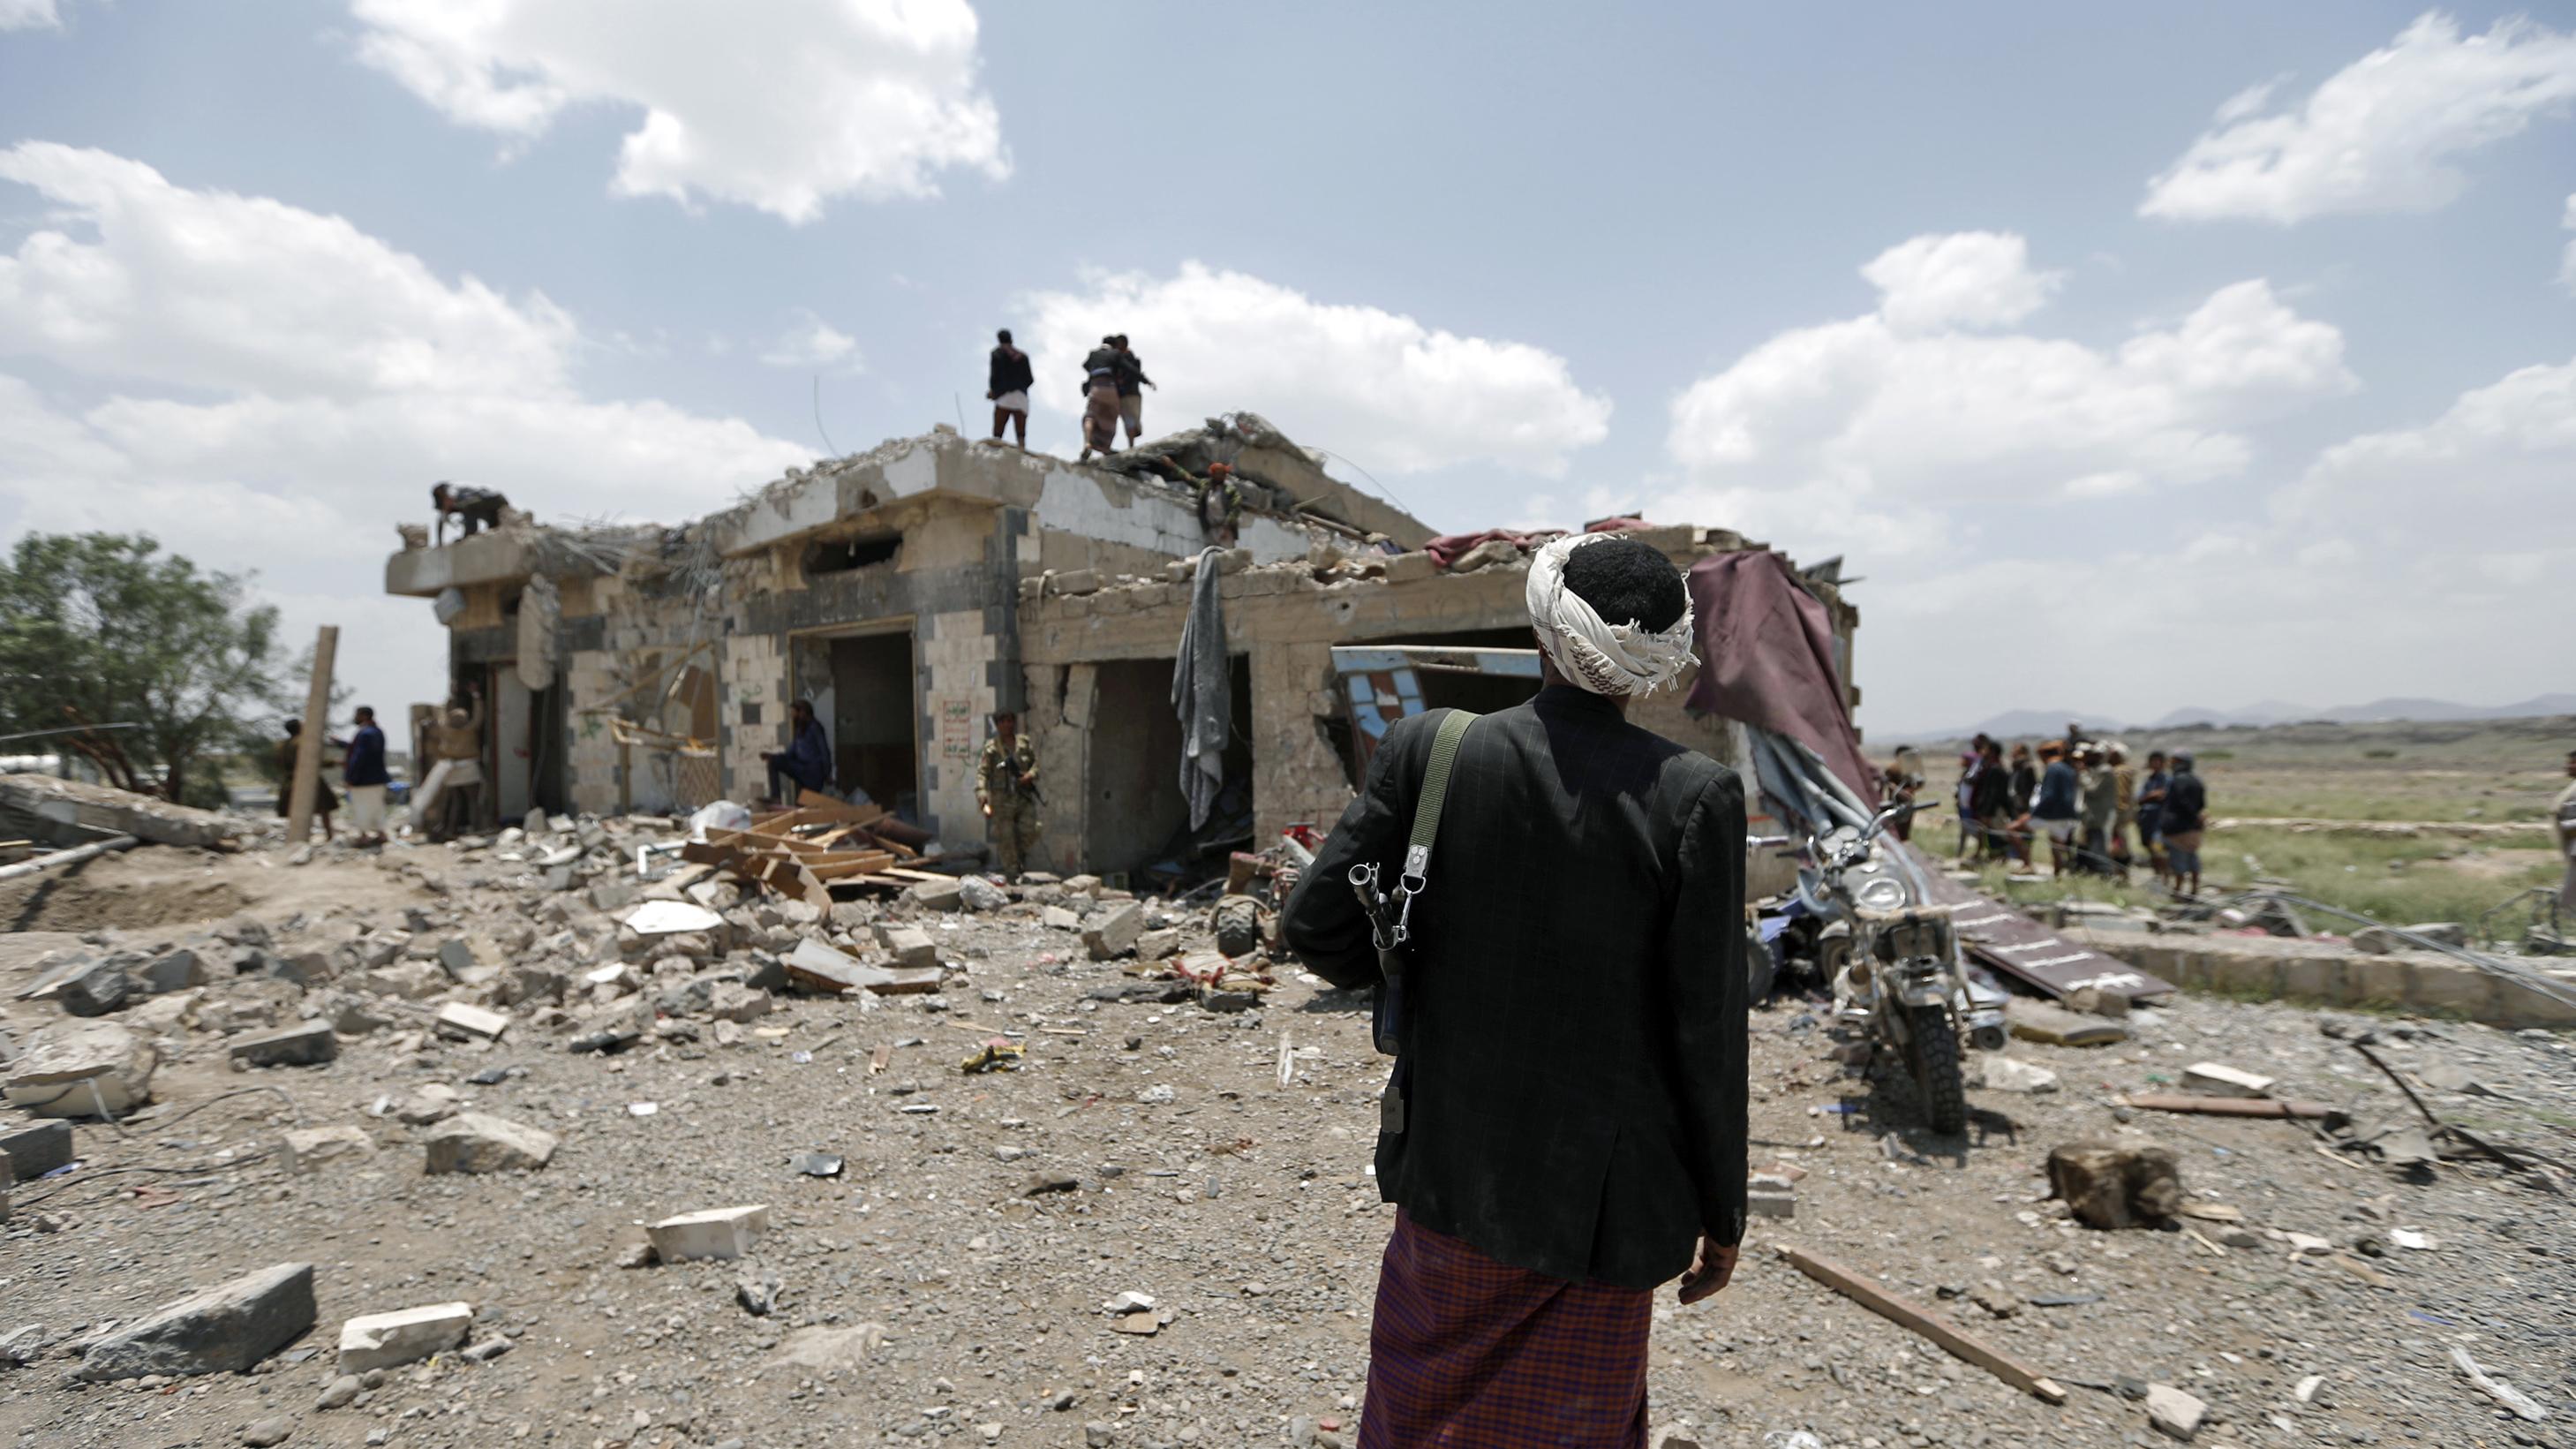 Children among 14 dead in new raid on Yemen